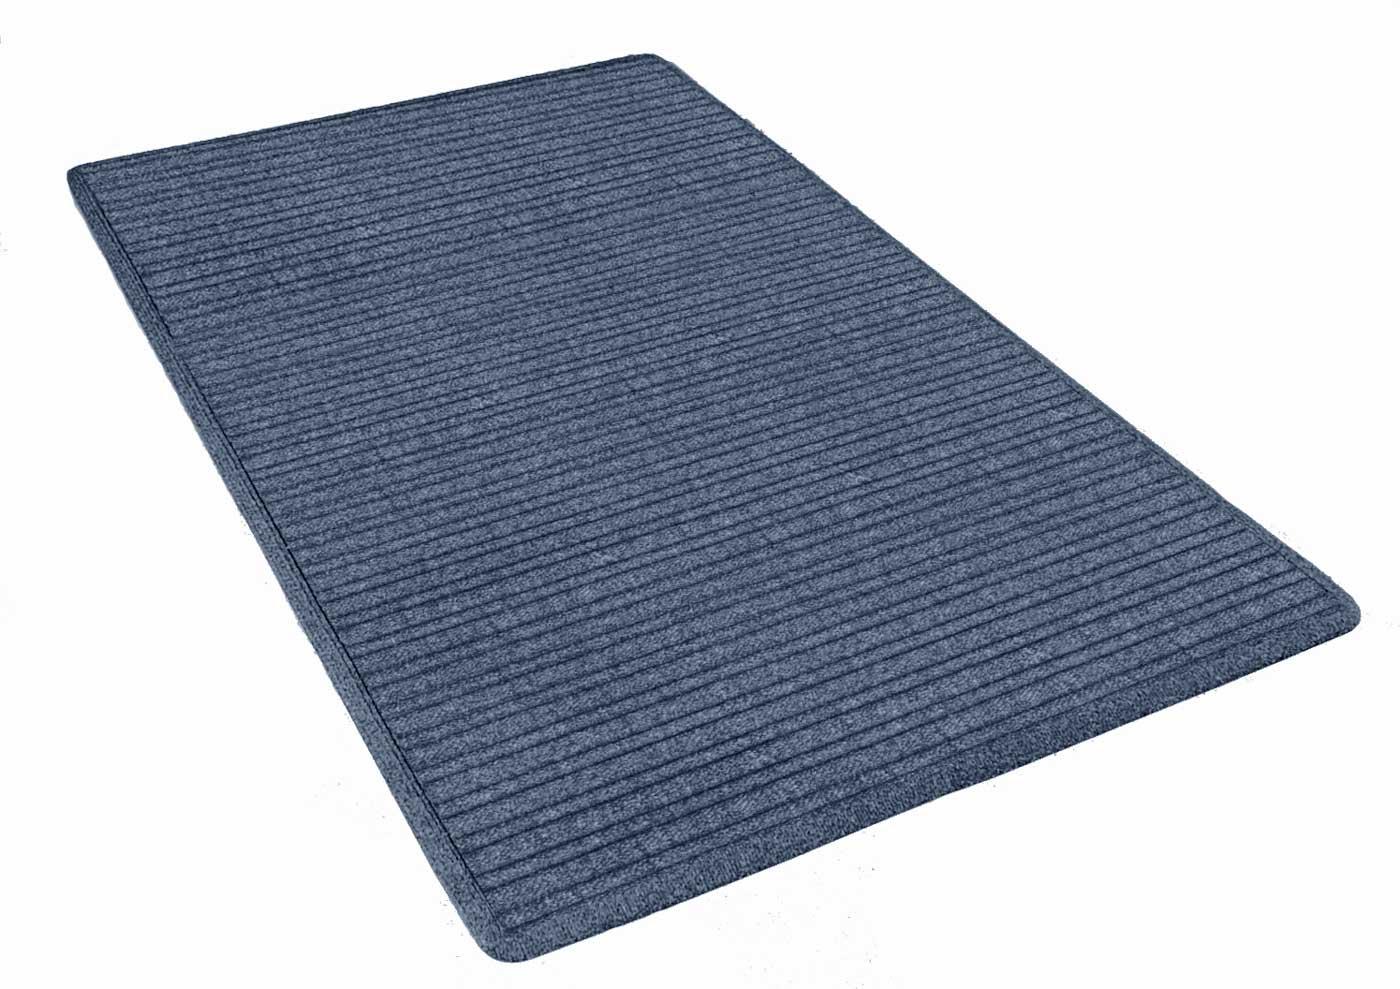 3 X 5 Anti Microbial Carpet Mat In Doormats